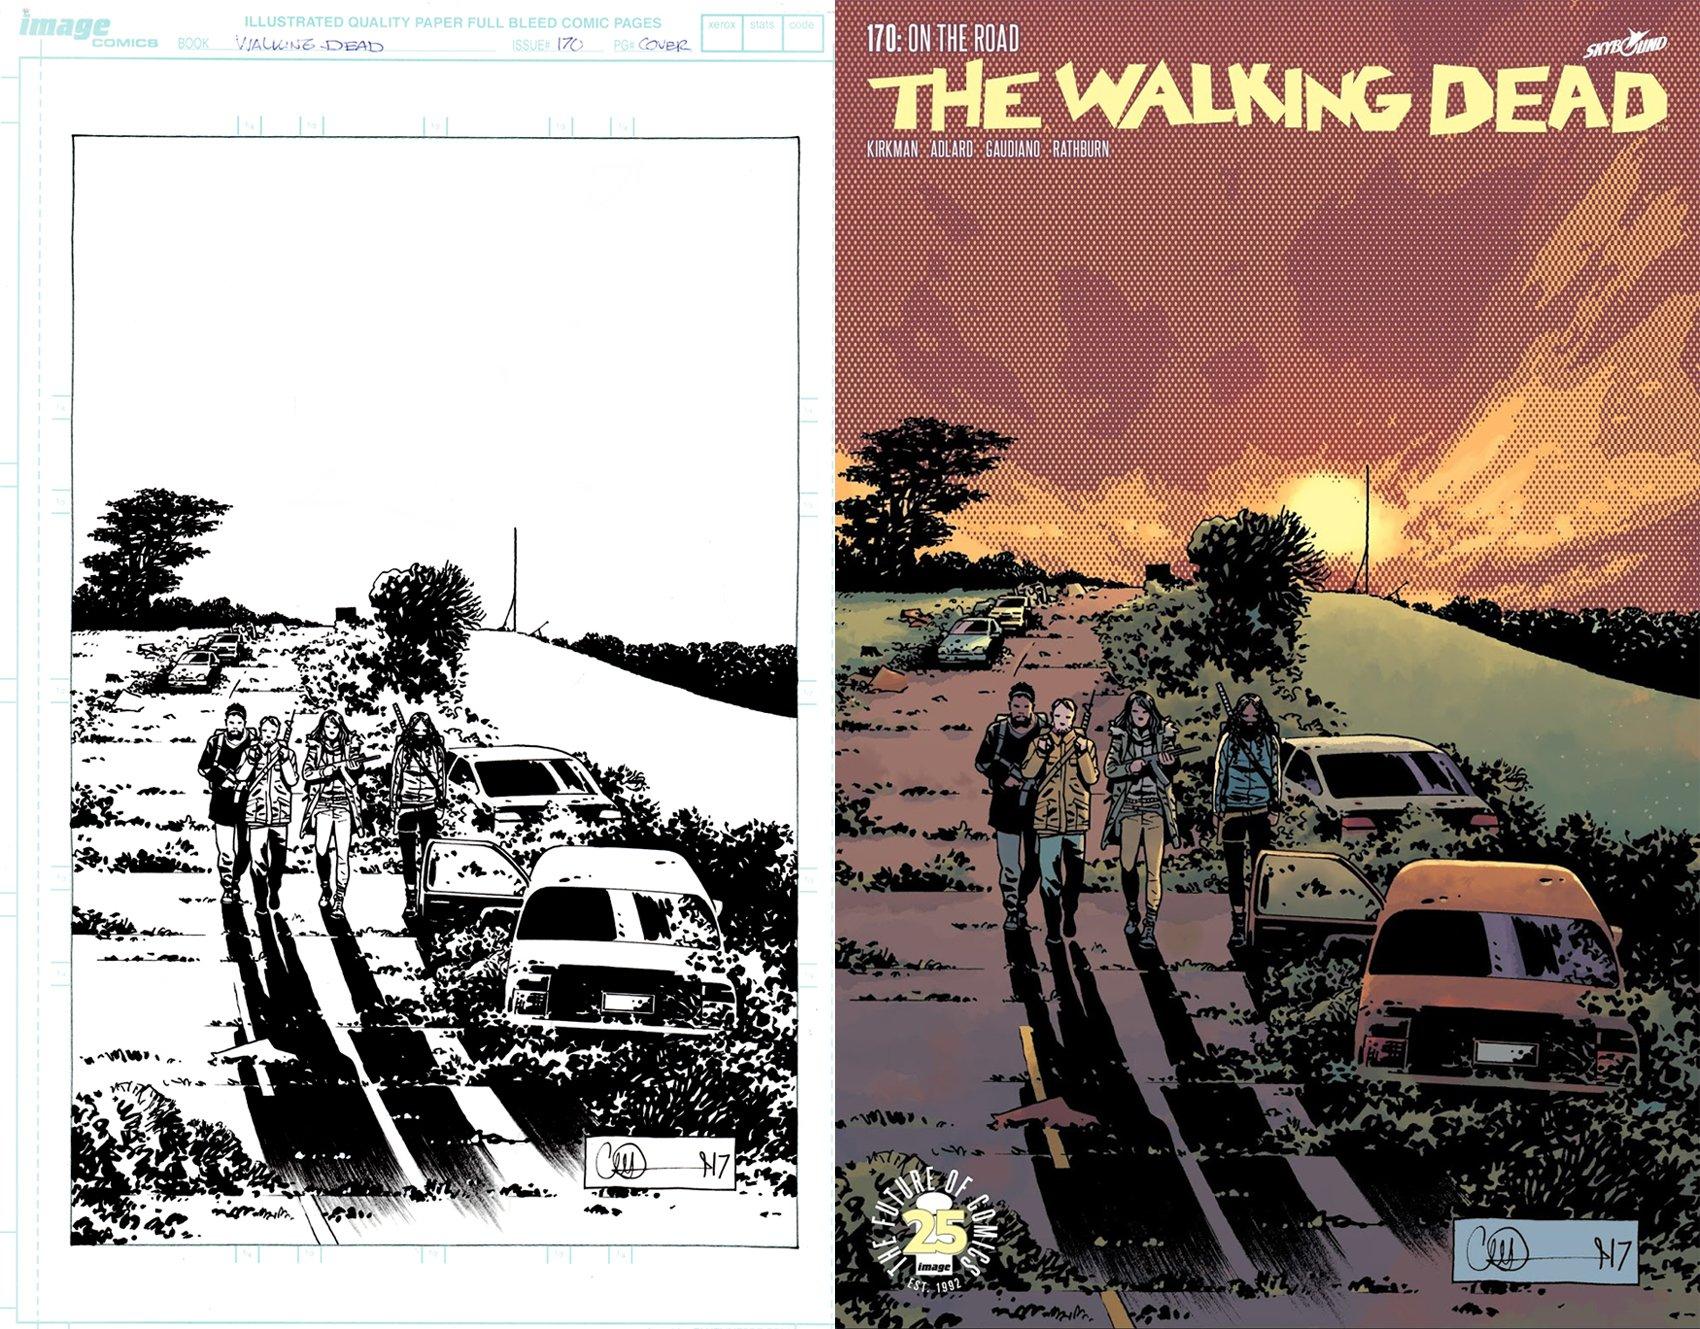 The Walking Dead #170 Cover (Michonne, Eugene, Magna, Siddiq!) 2017